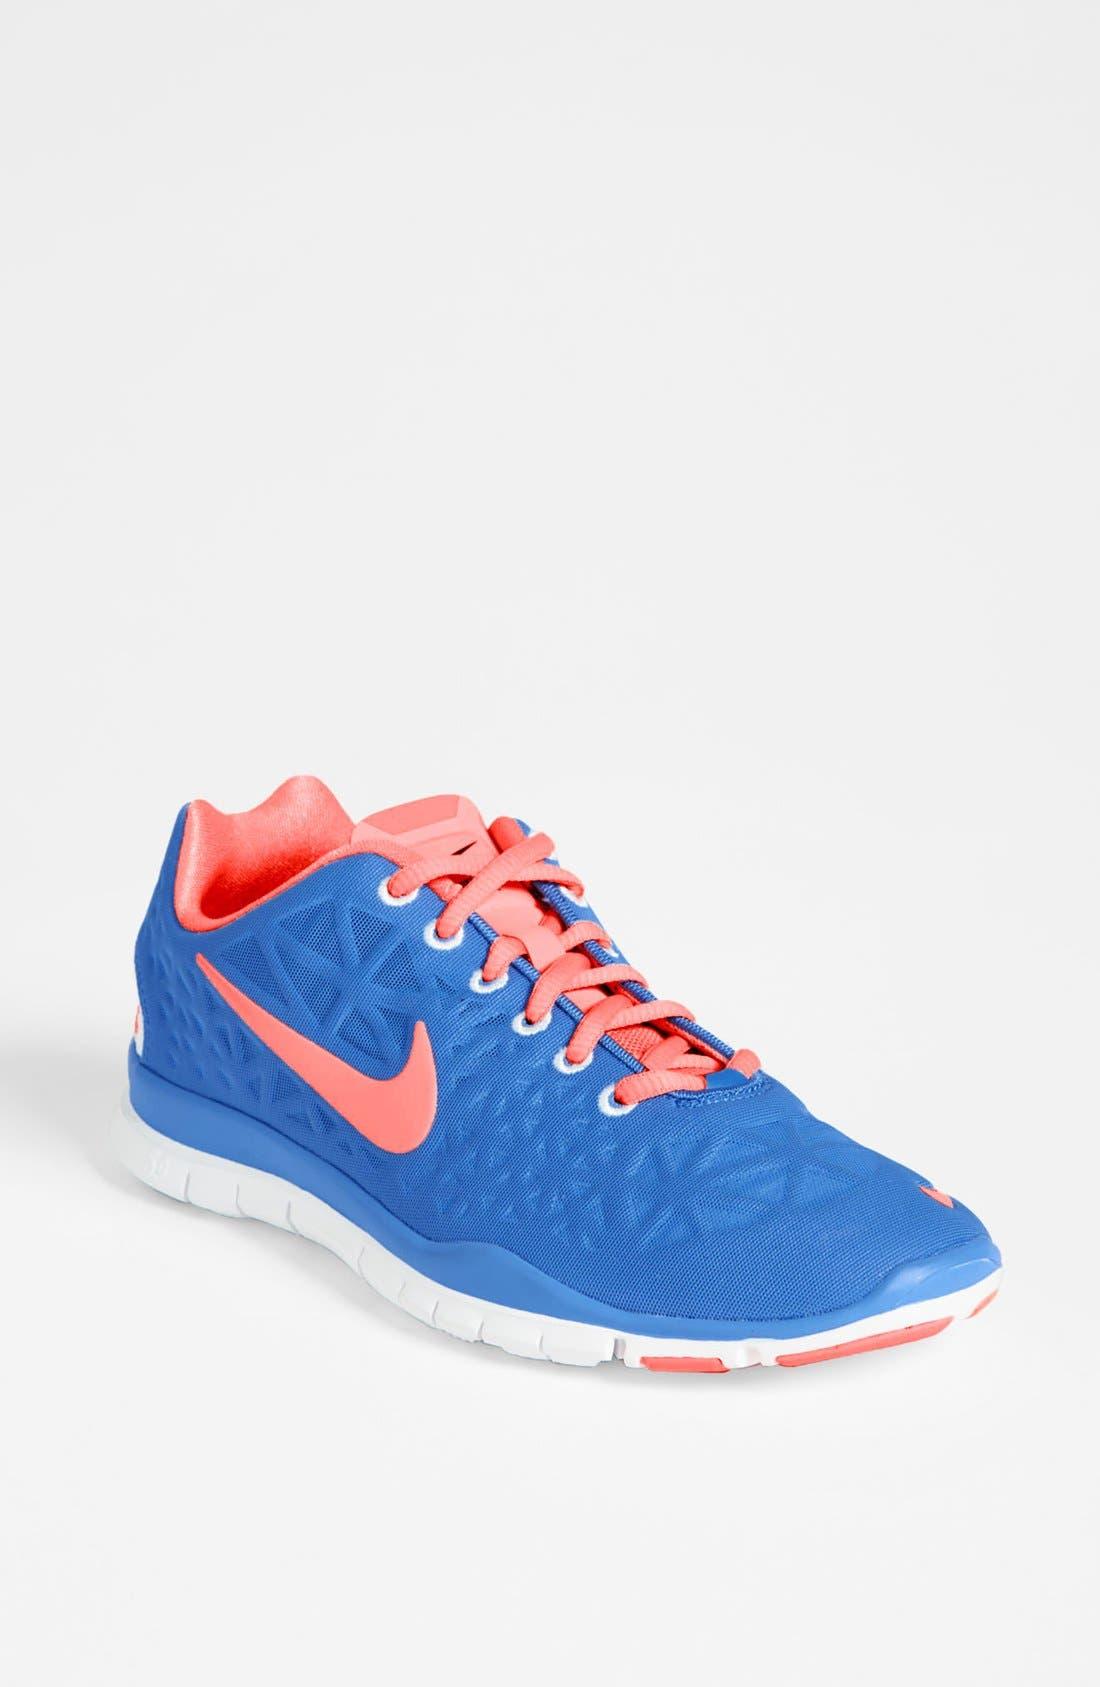 Alternate Image 1 Selected - Nike 'Free TR Fit 3' Training Shoe (Women)